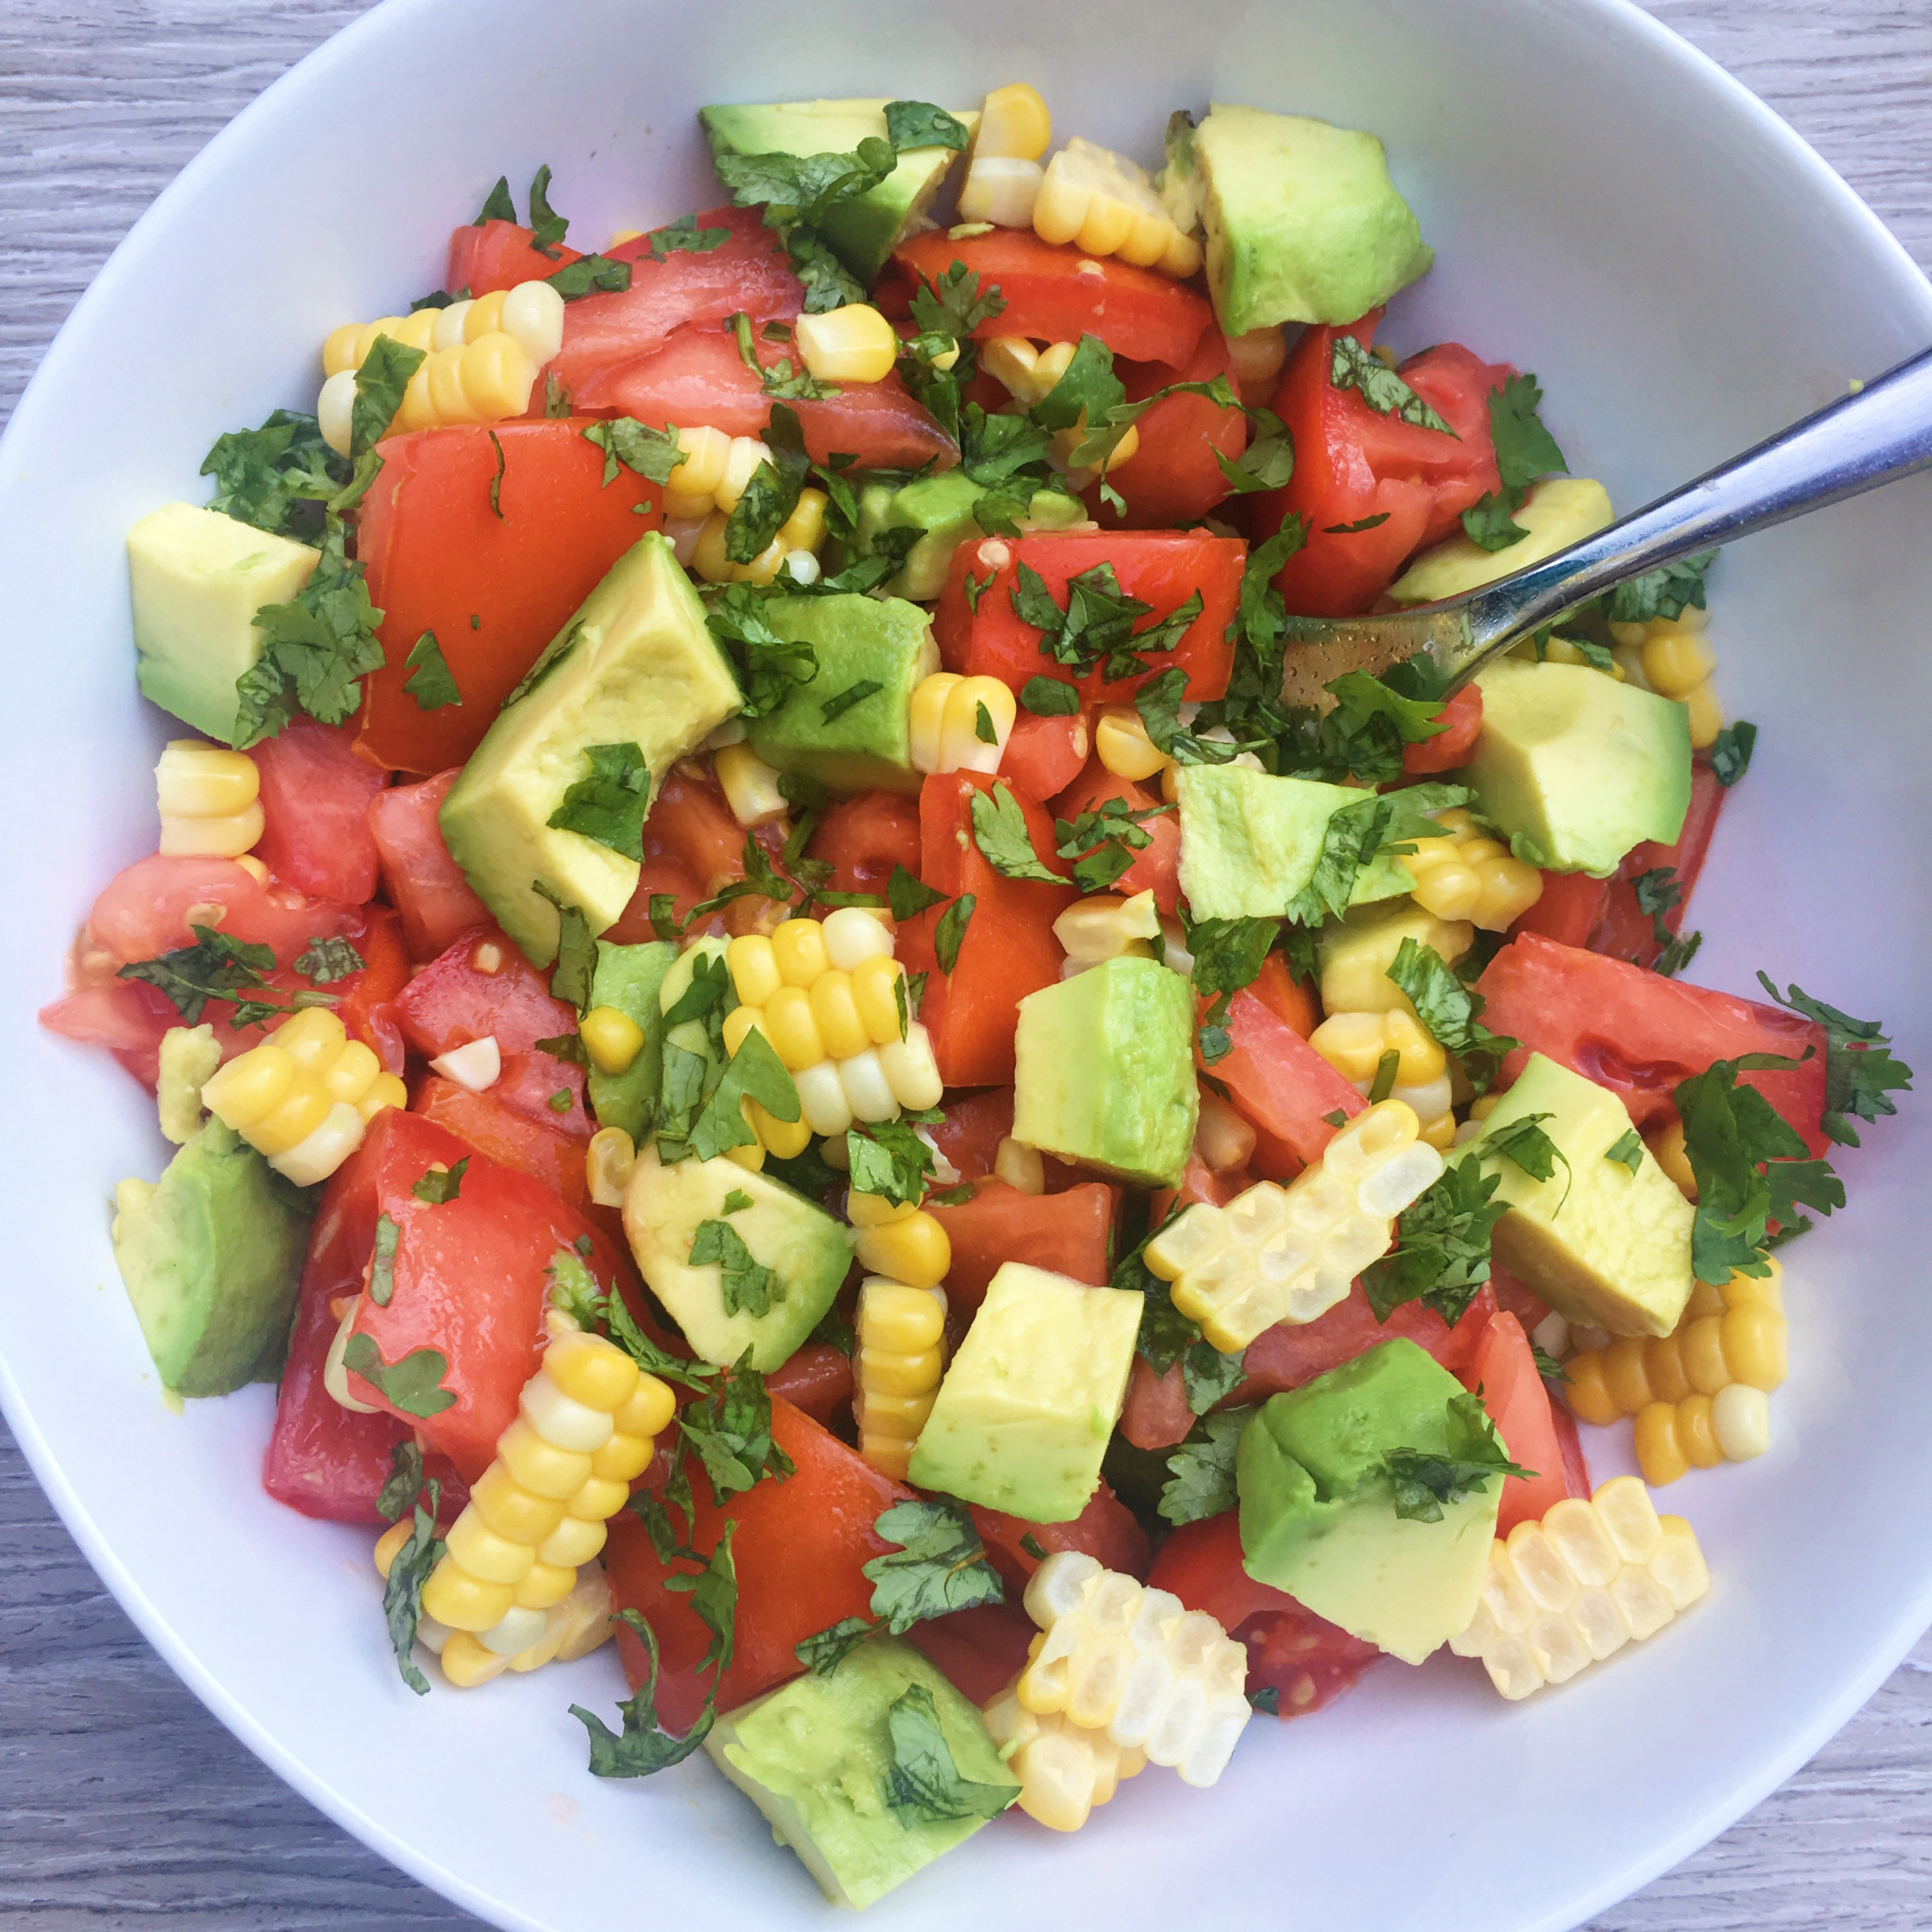 Tomato Corn & Avocado Salad gluten free easy www.healthygffamily.com